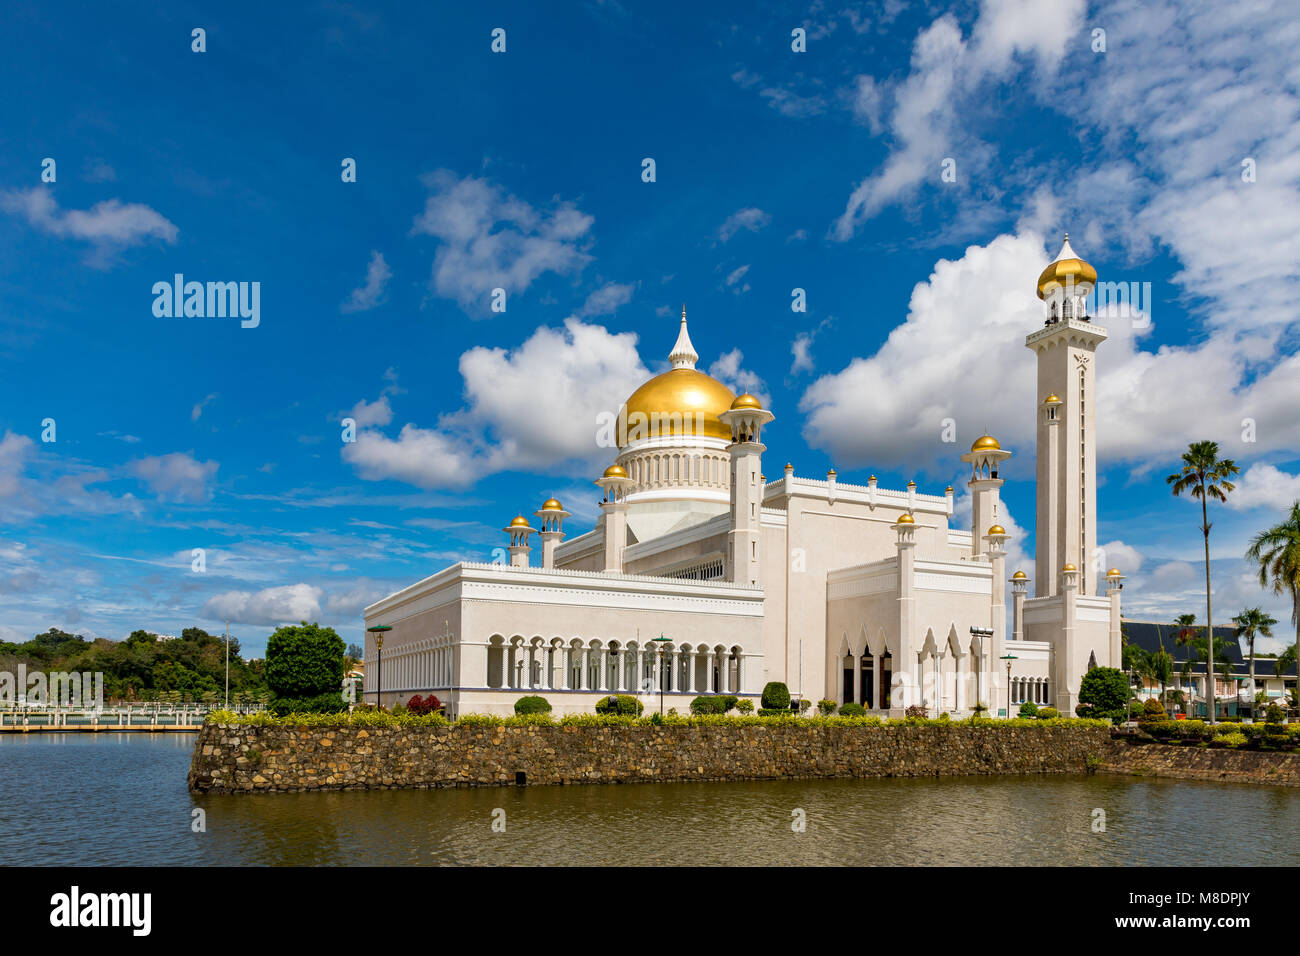 Brunei Darussalam Bandar Seri Begawan Sultan Omar Ali Saifuddien Mosque March 16, 2018 One of Brunei's most - Stock Image